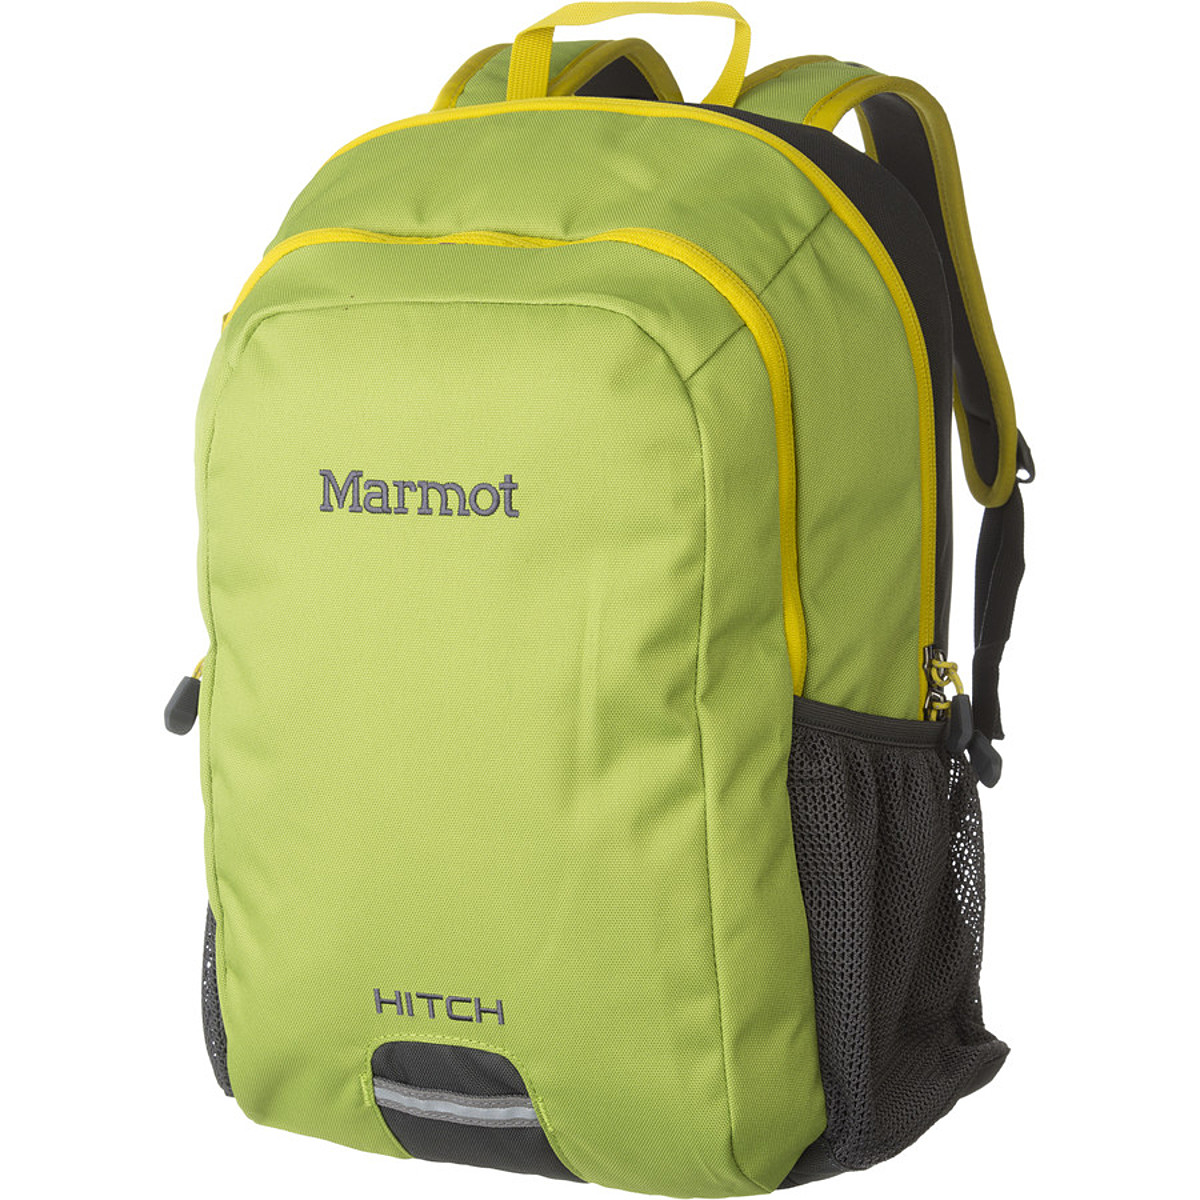 Marmot Hitch